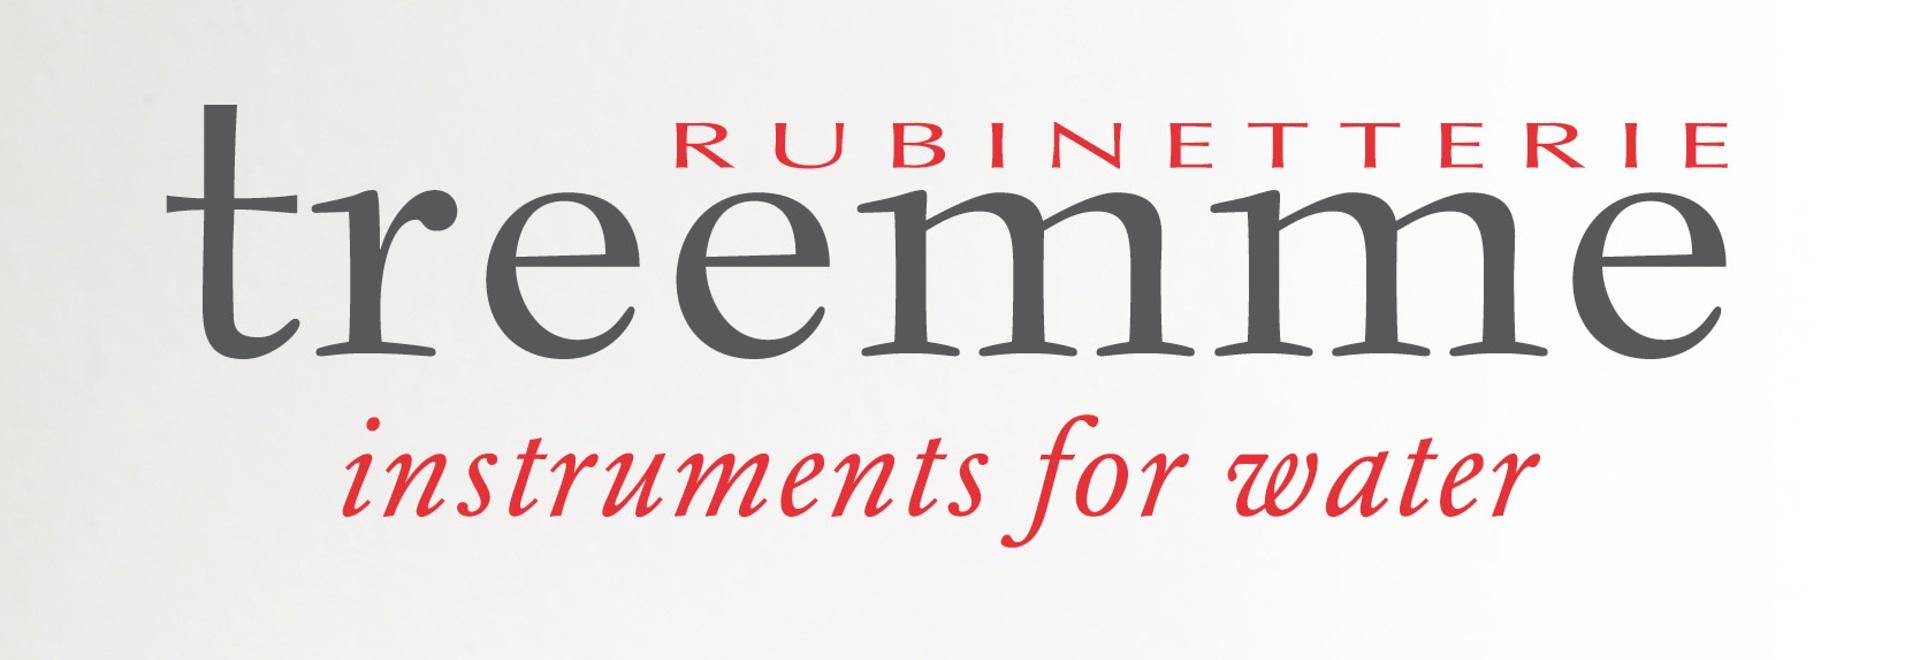 Rubinetterie Treemme al Cersaie 2018 – Hall 29 Stand A46 B47